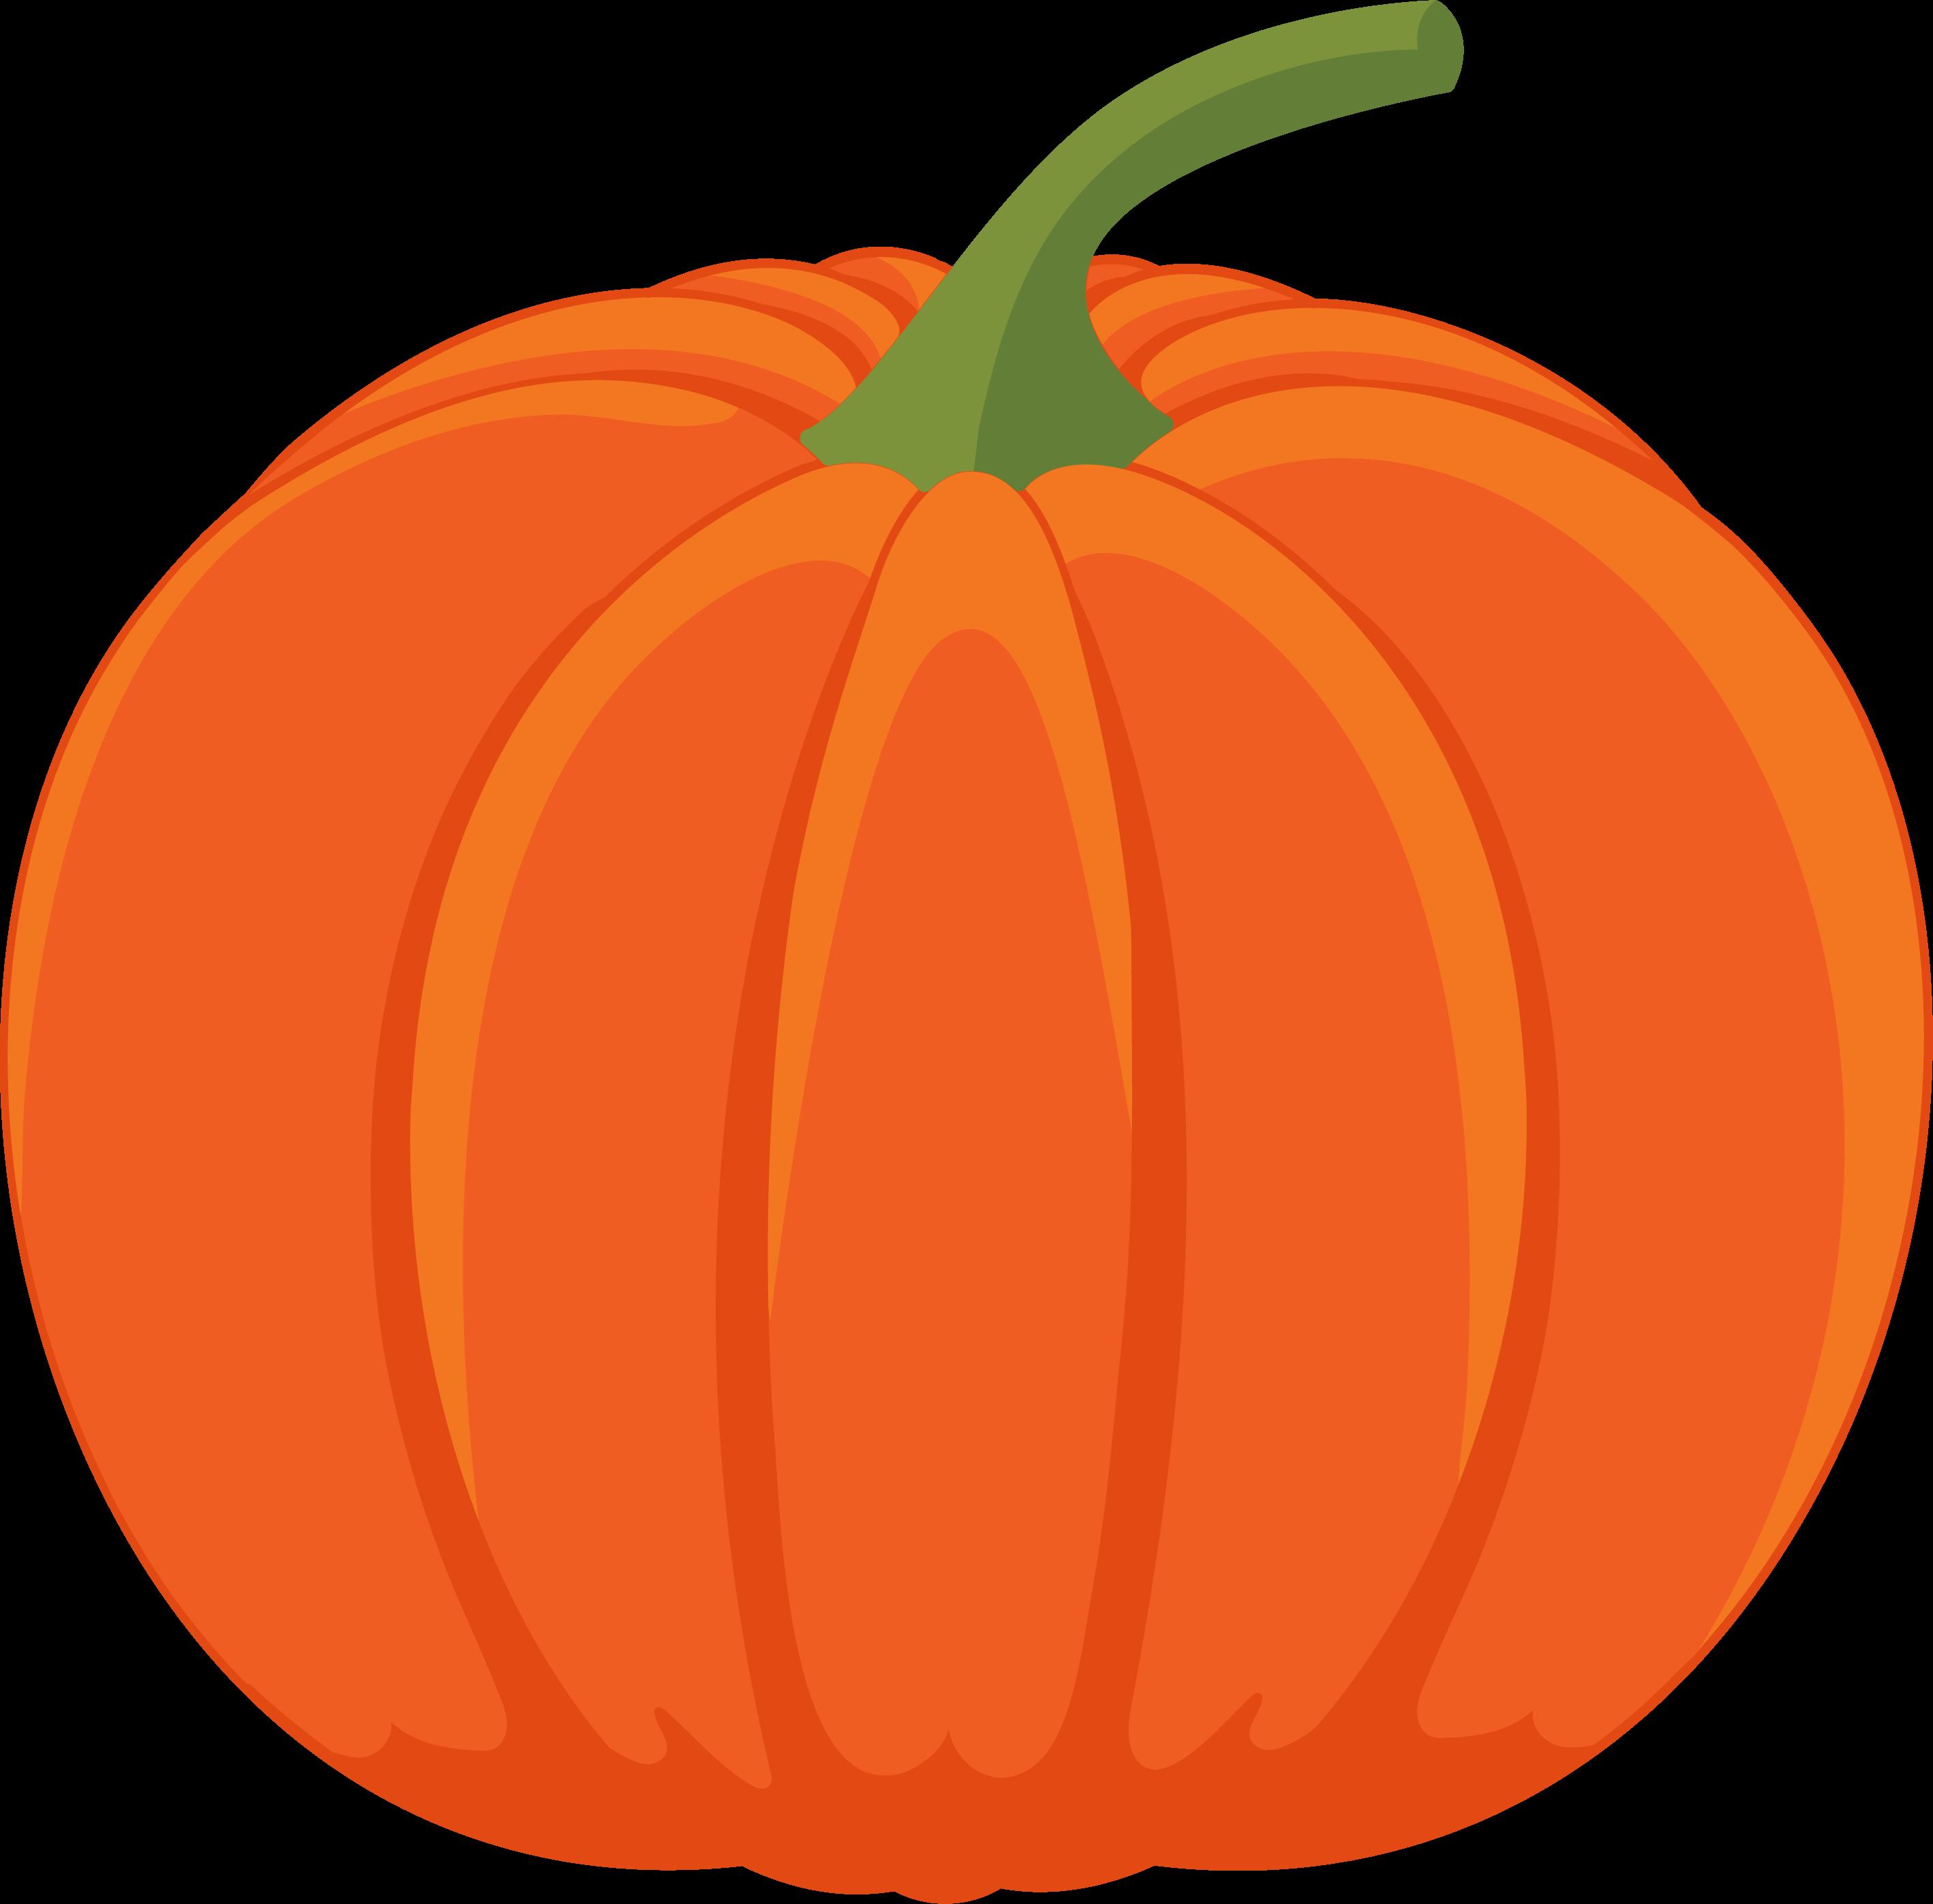 My Favorite Fall Pumpkin SVG Cut File